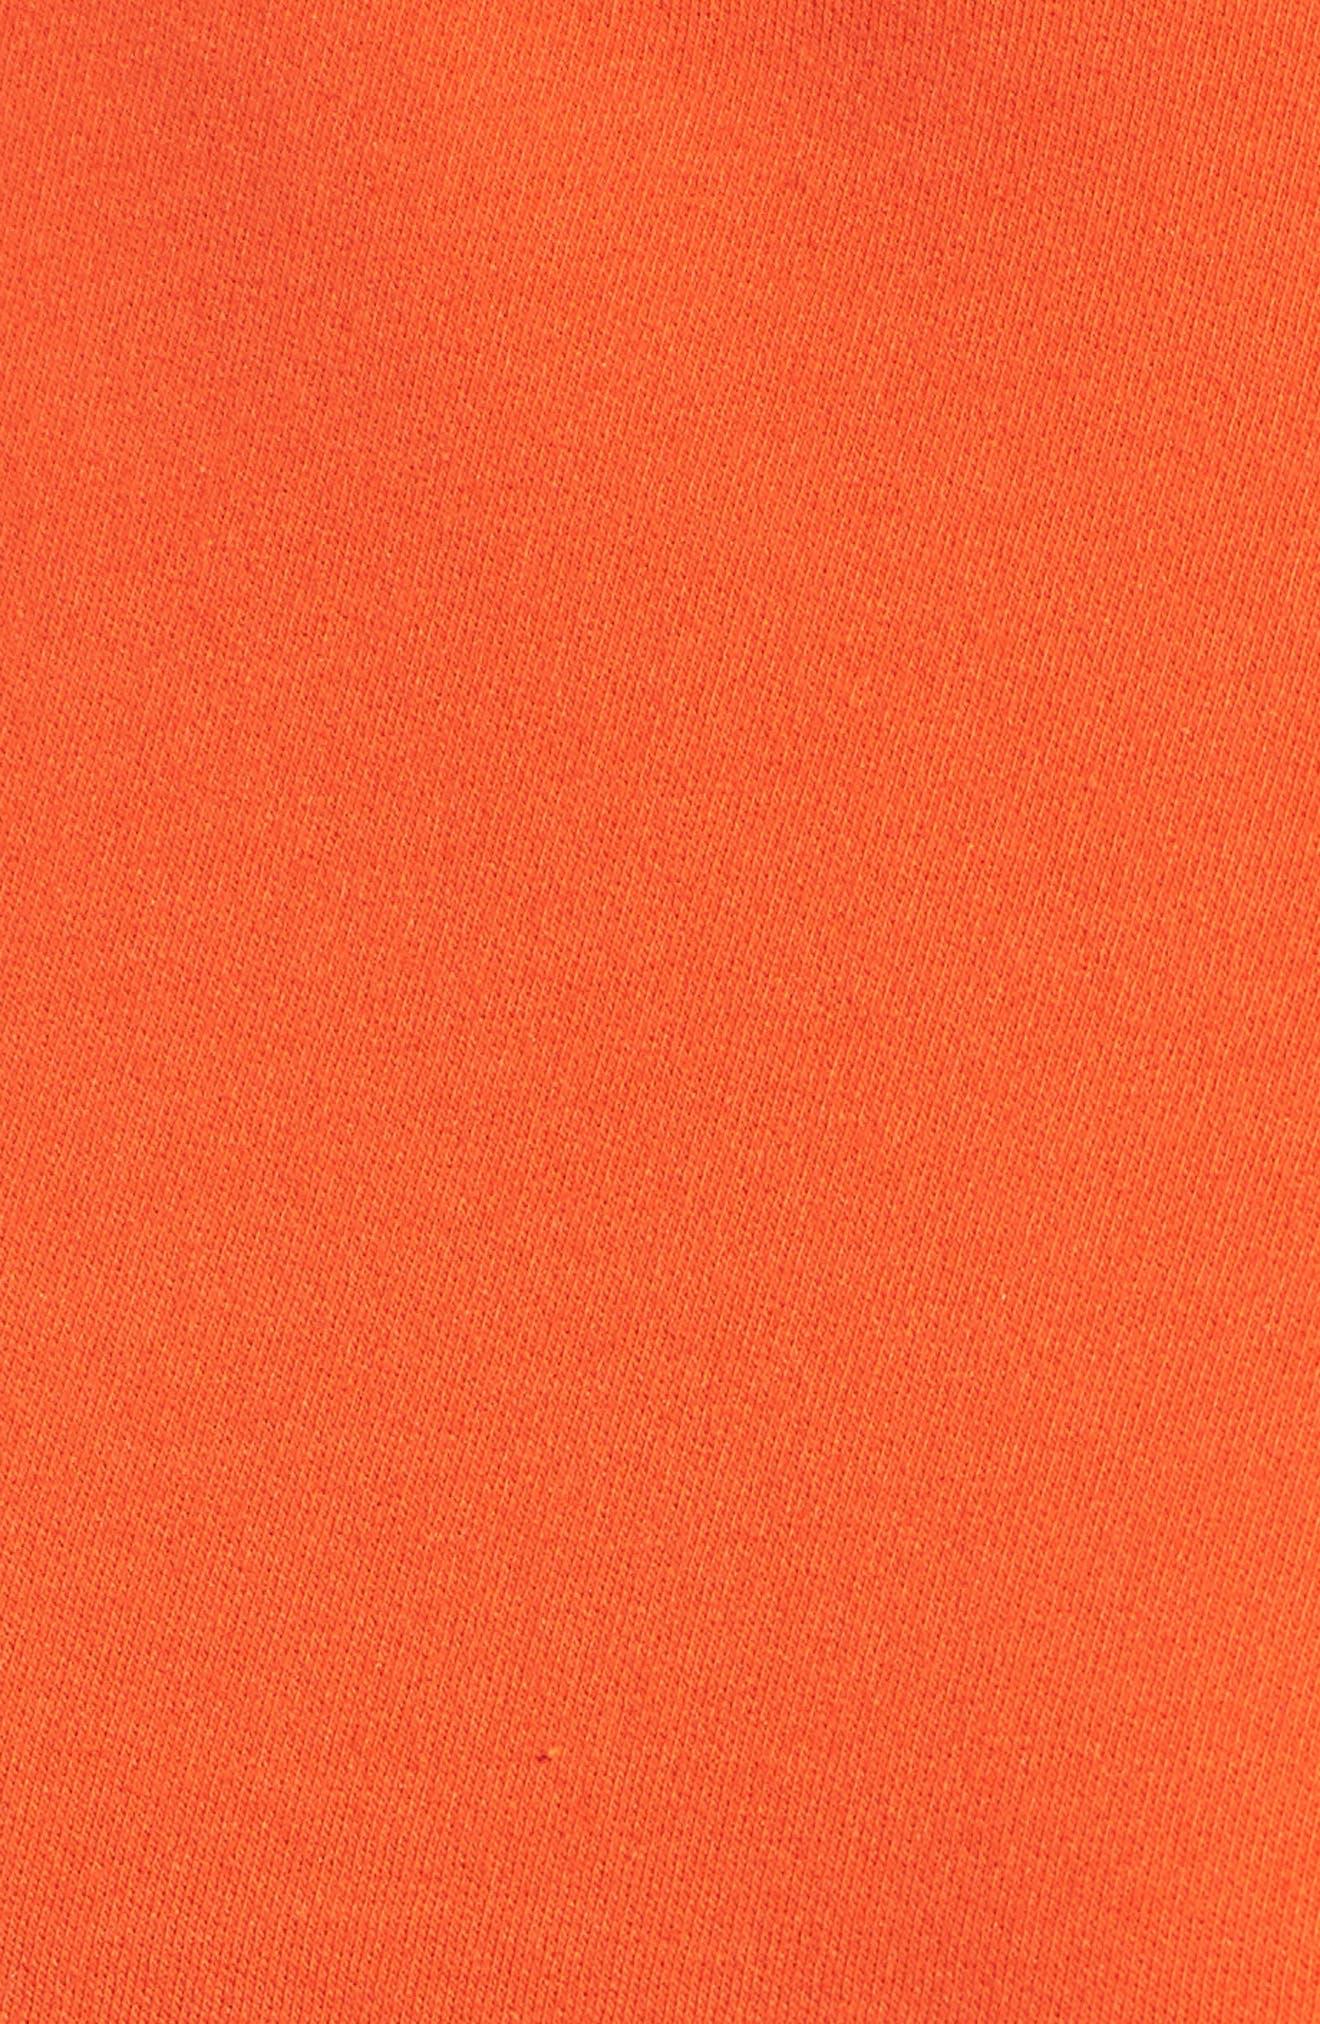 FENTY PUMA by Rihanna Lace-Up Back Sweatshirt,                             Alternate thumbnail 6, color,                             Cherry Tomato